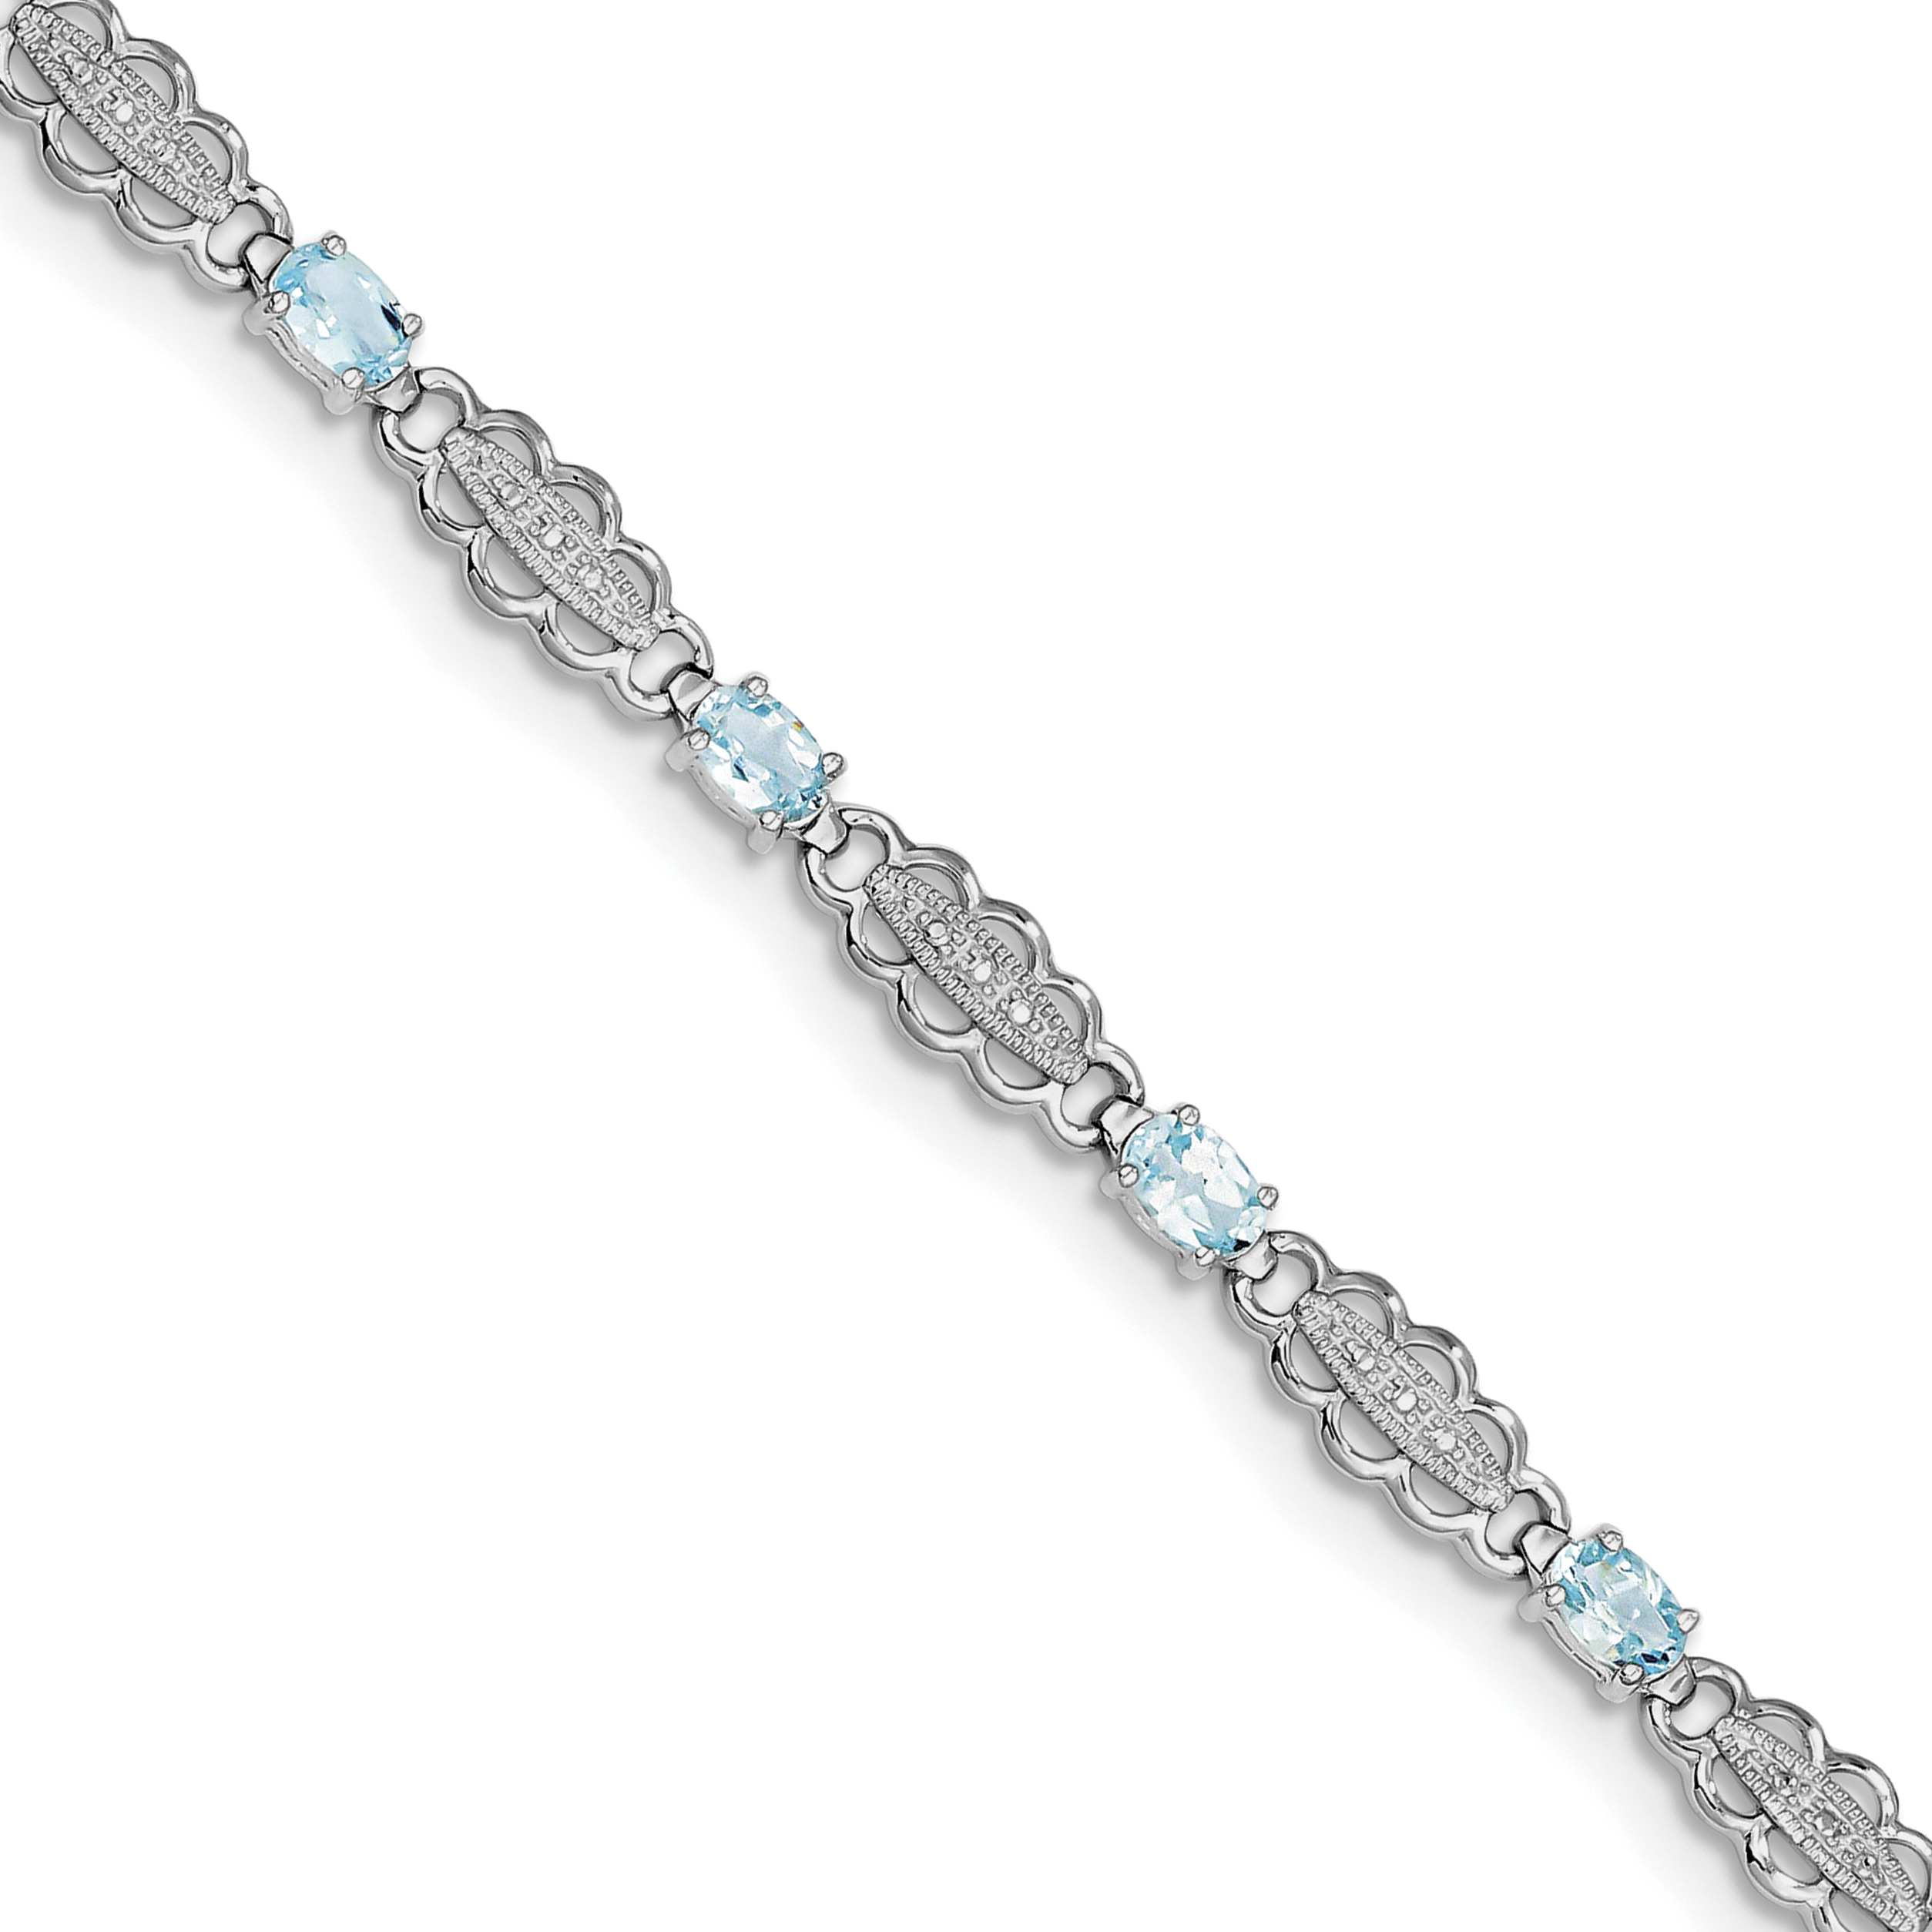 925 Sterling Silver Rhodium-plated Aquamarine & Diamond Bracelet by